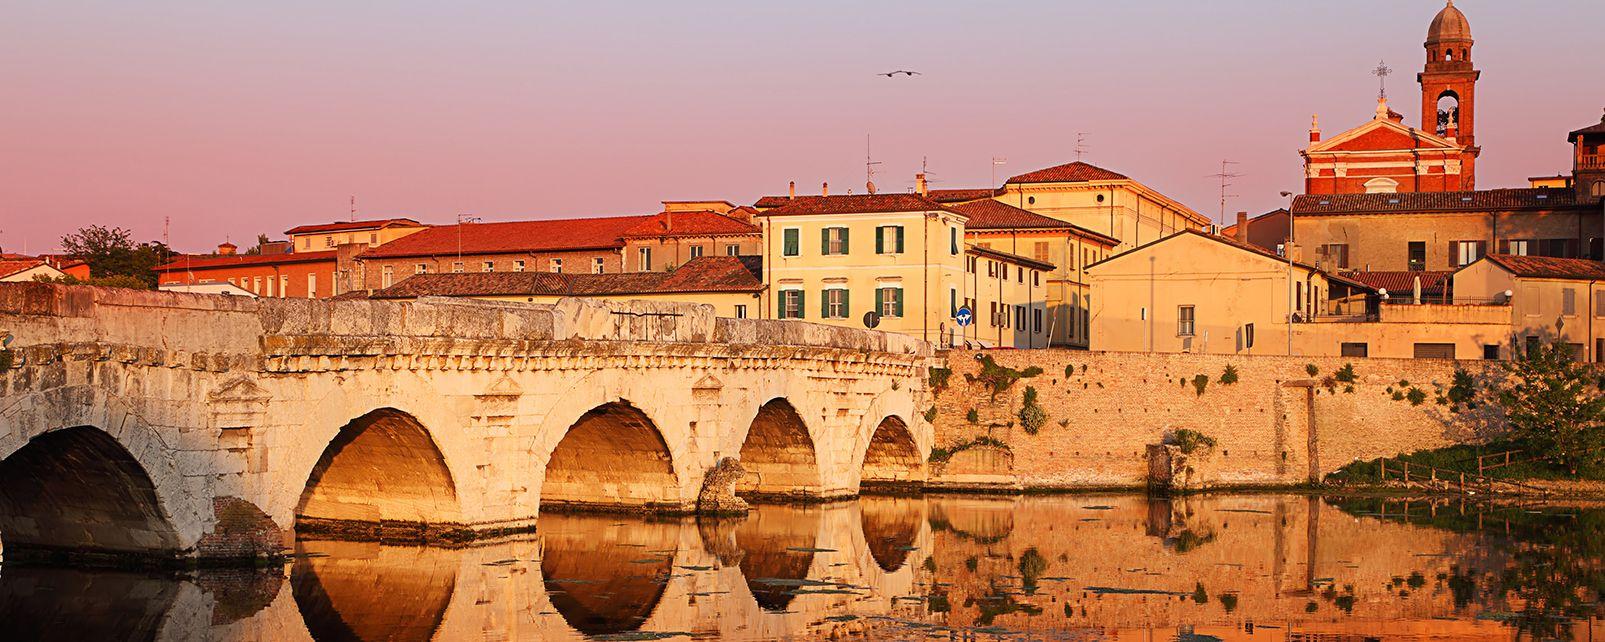 Il ponte di Tiberio, Rimini, Emilia-Romagna, Italia